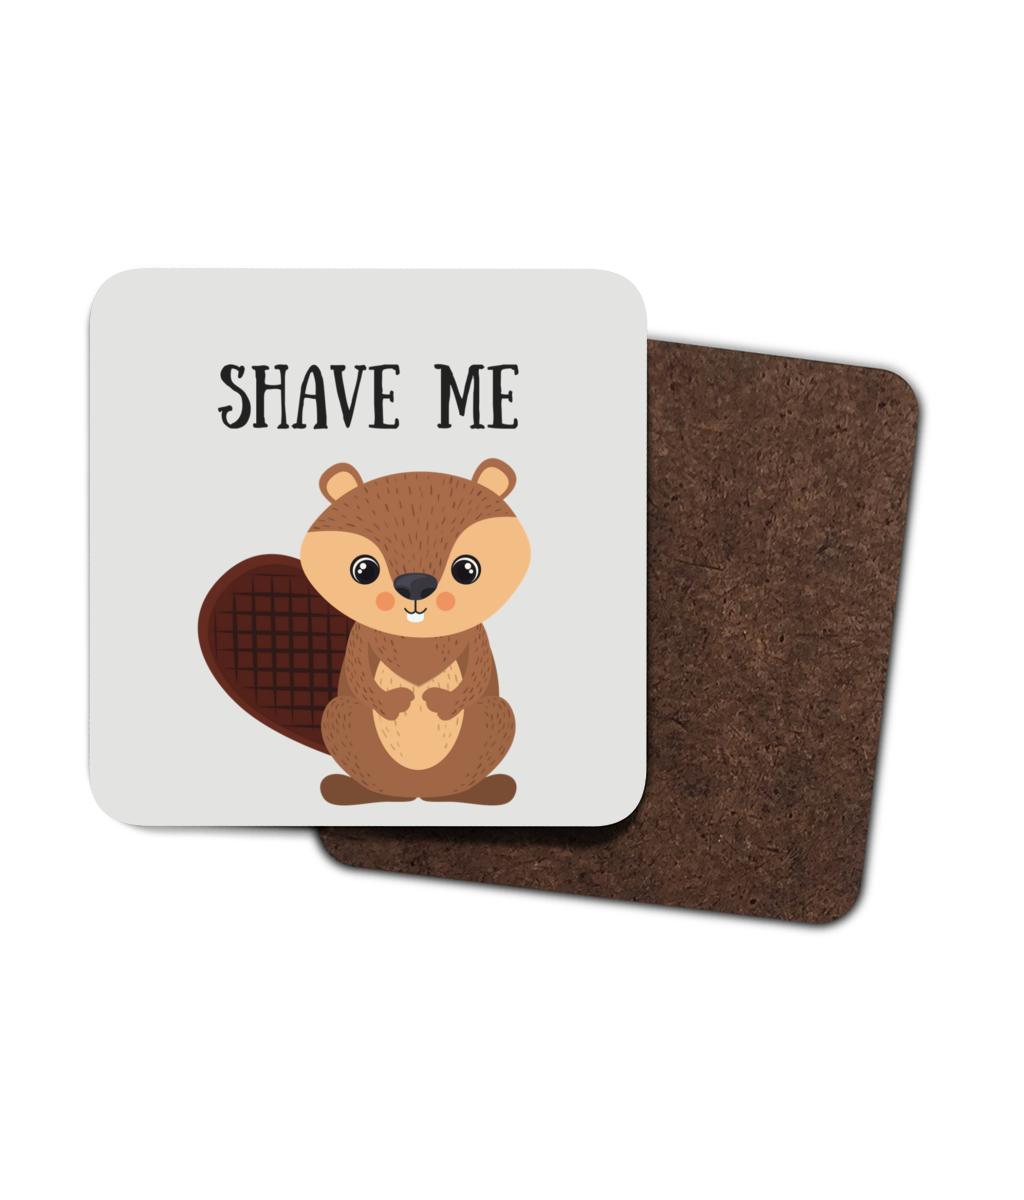 Shave Beaver 4 Pack Hardboard Coasters front